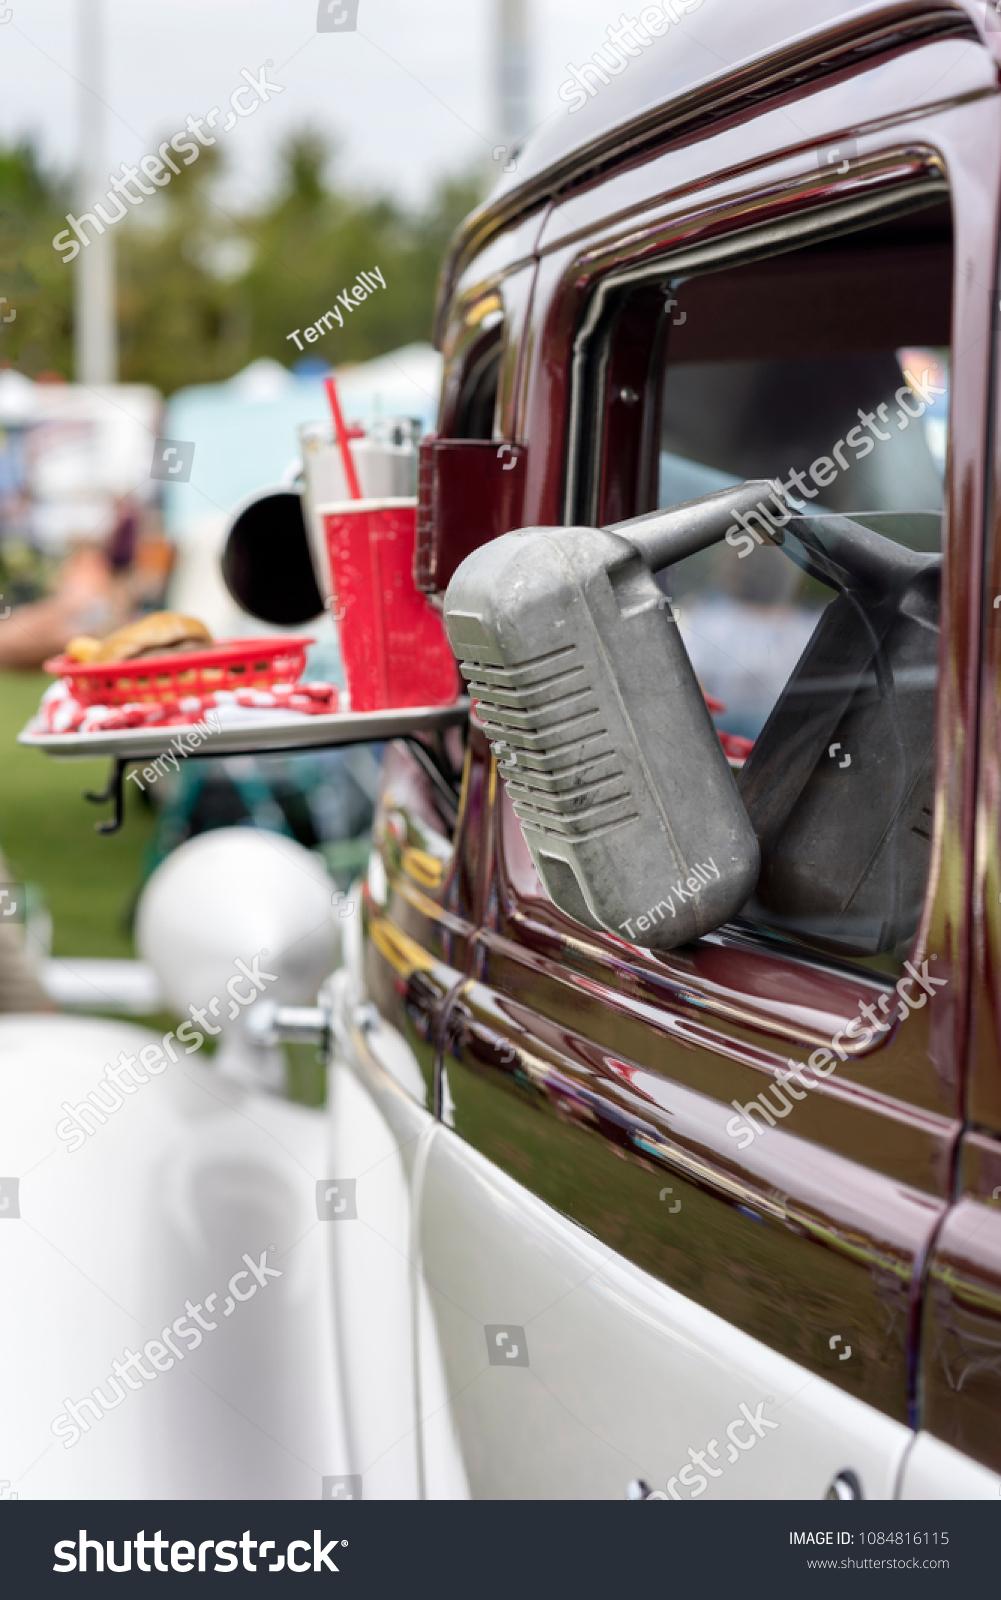 Drive Movie Theater Speaker Hanging Window Vintage Stock Image 1084816115